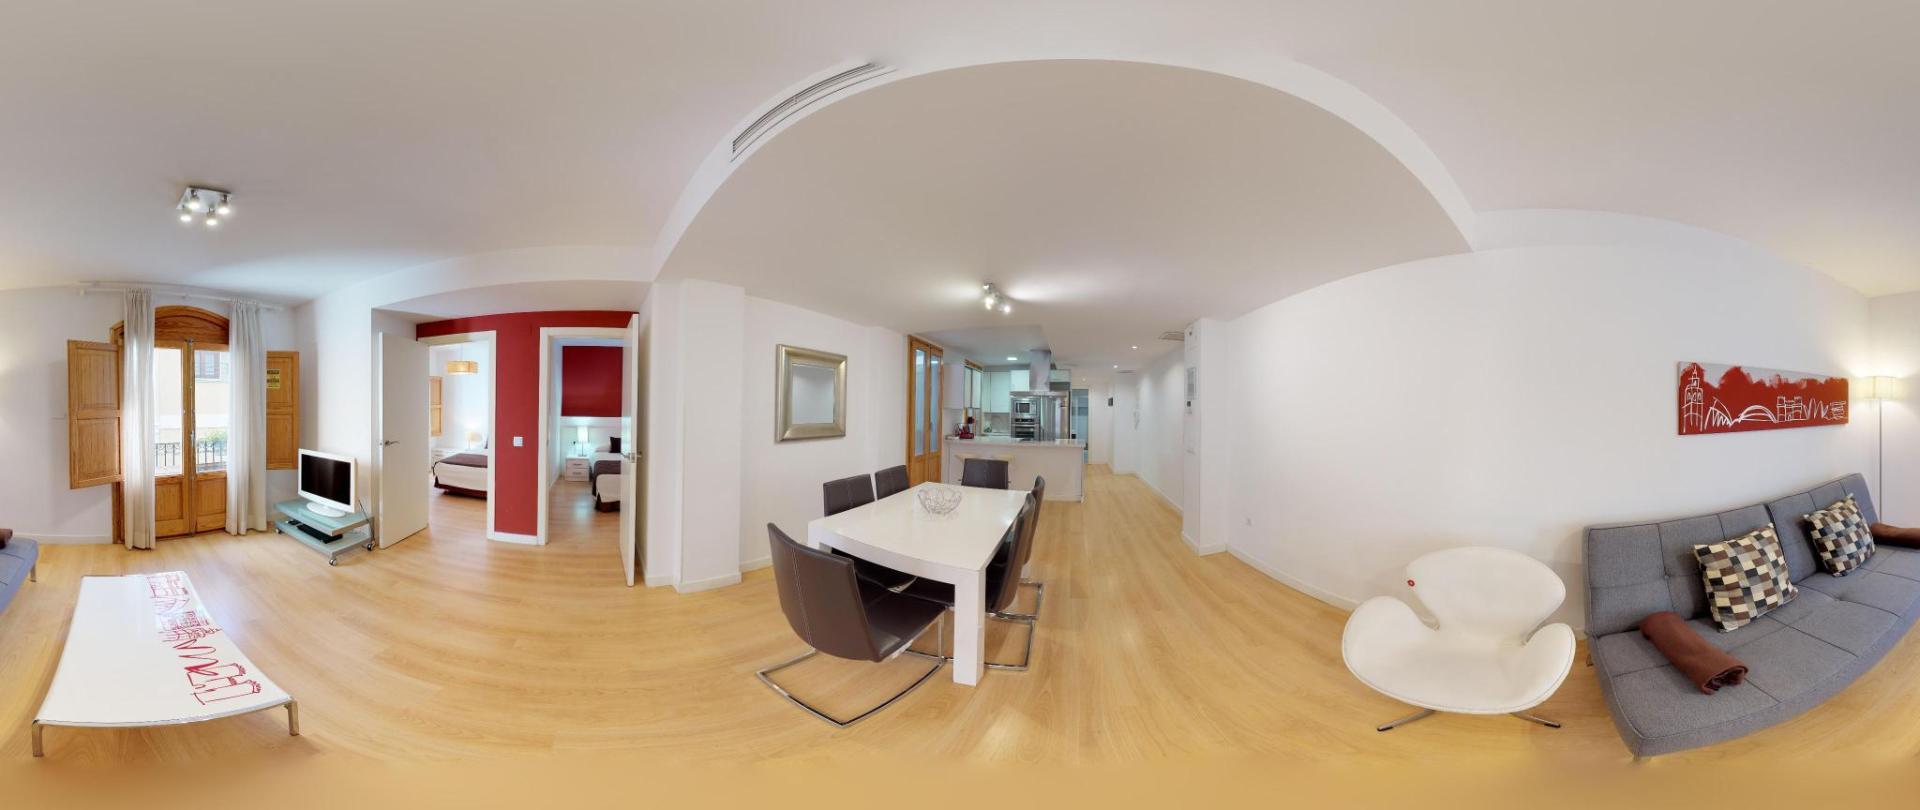 Apartamentos-EDIFICIO-PALOMAR-05172019_184014.jpg